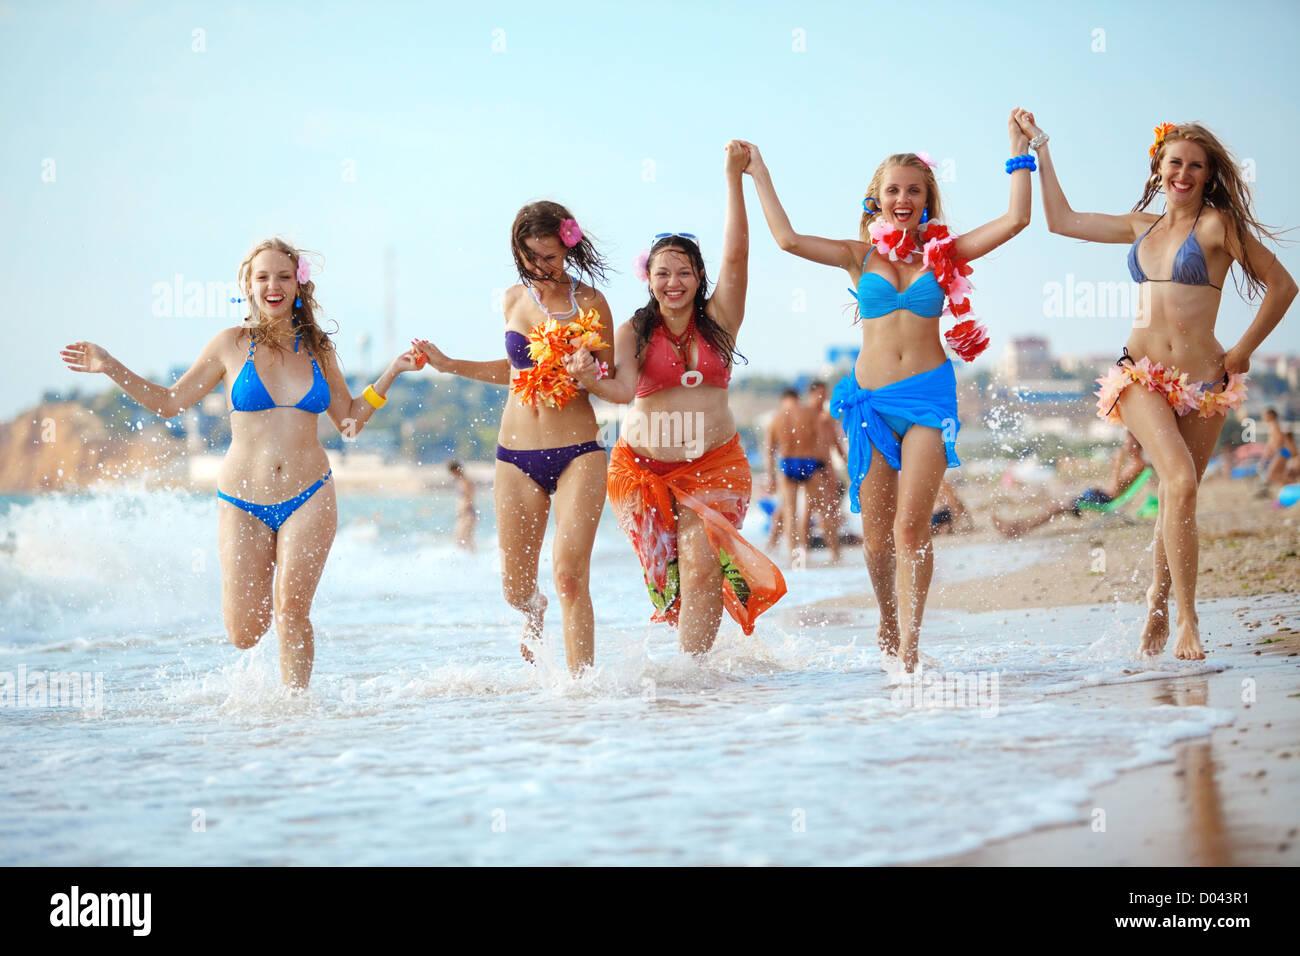 Chicas divirtiendose entre si